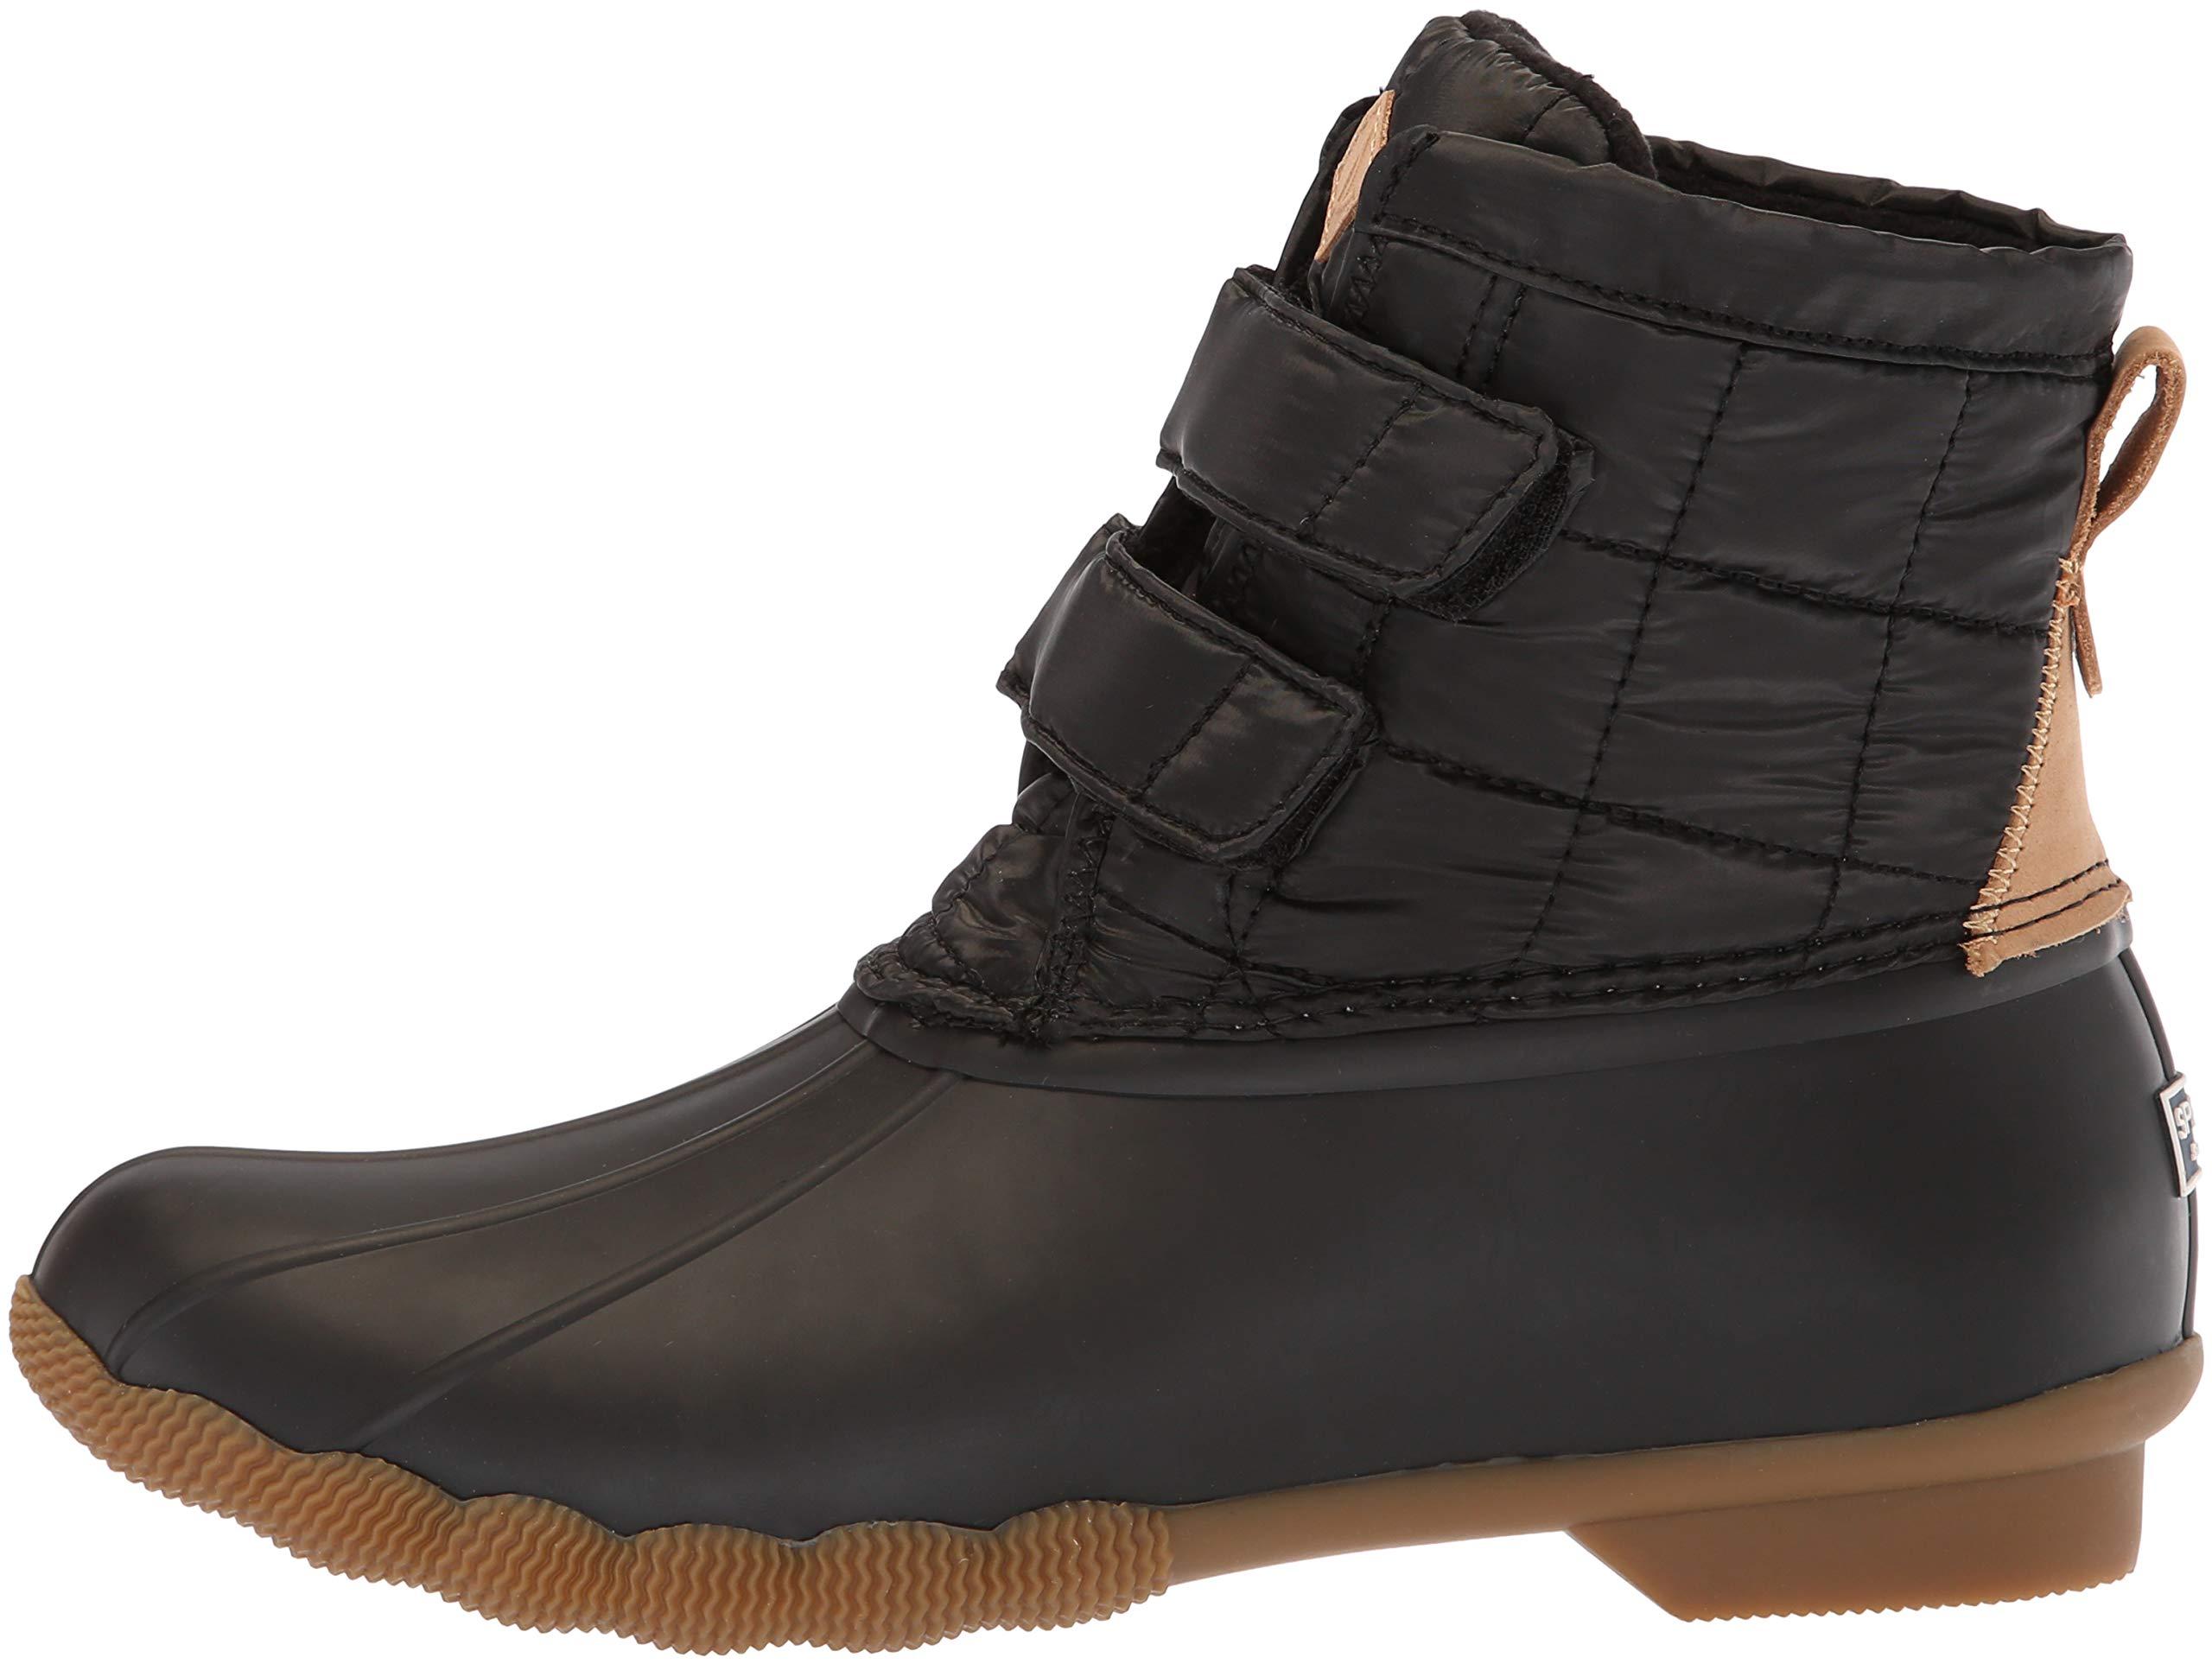 Saltwater Jetty Snow Boot, Black